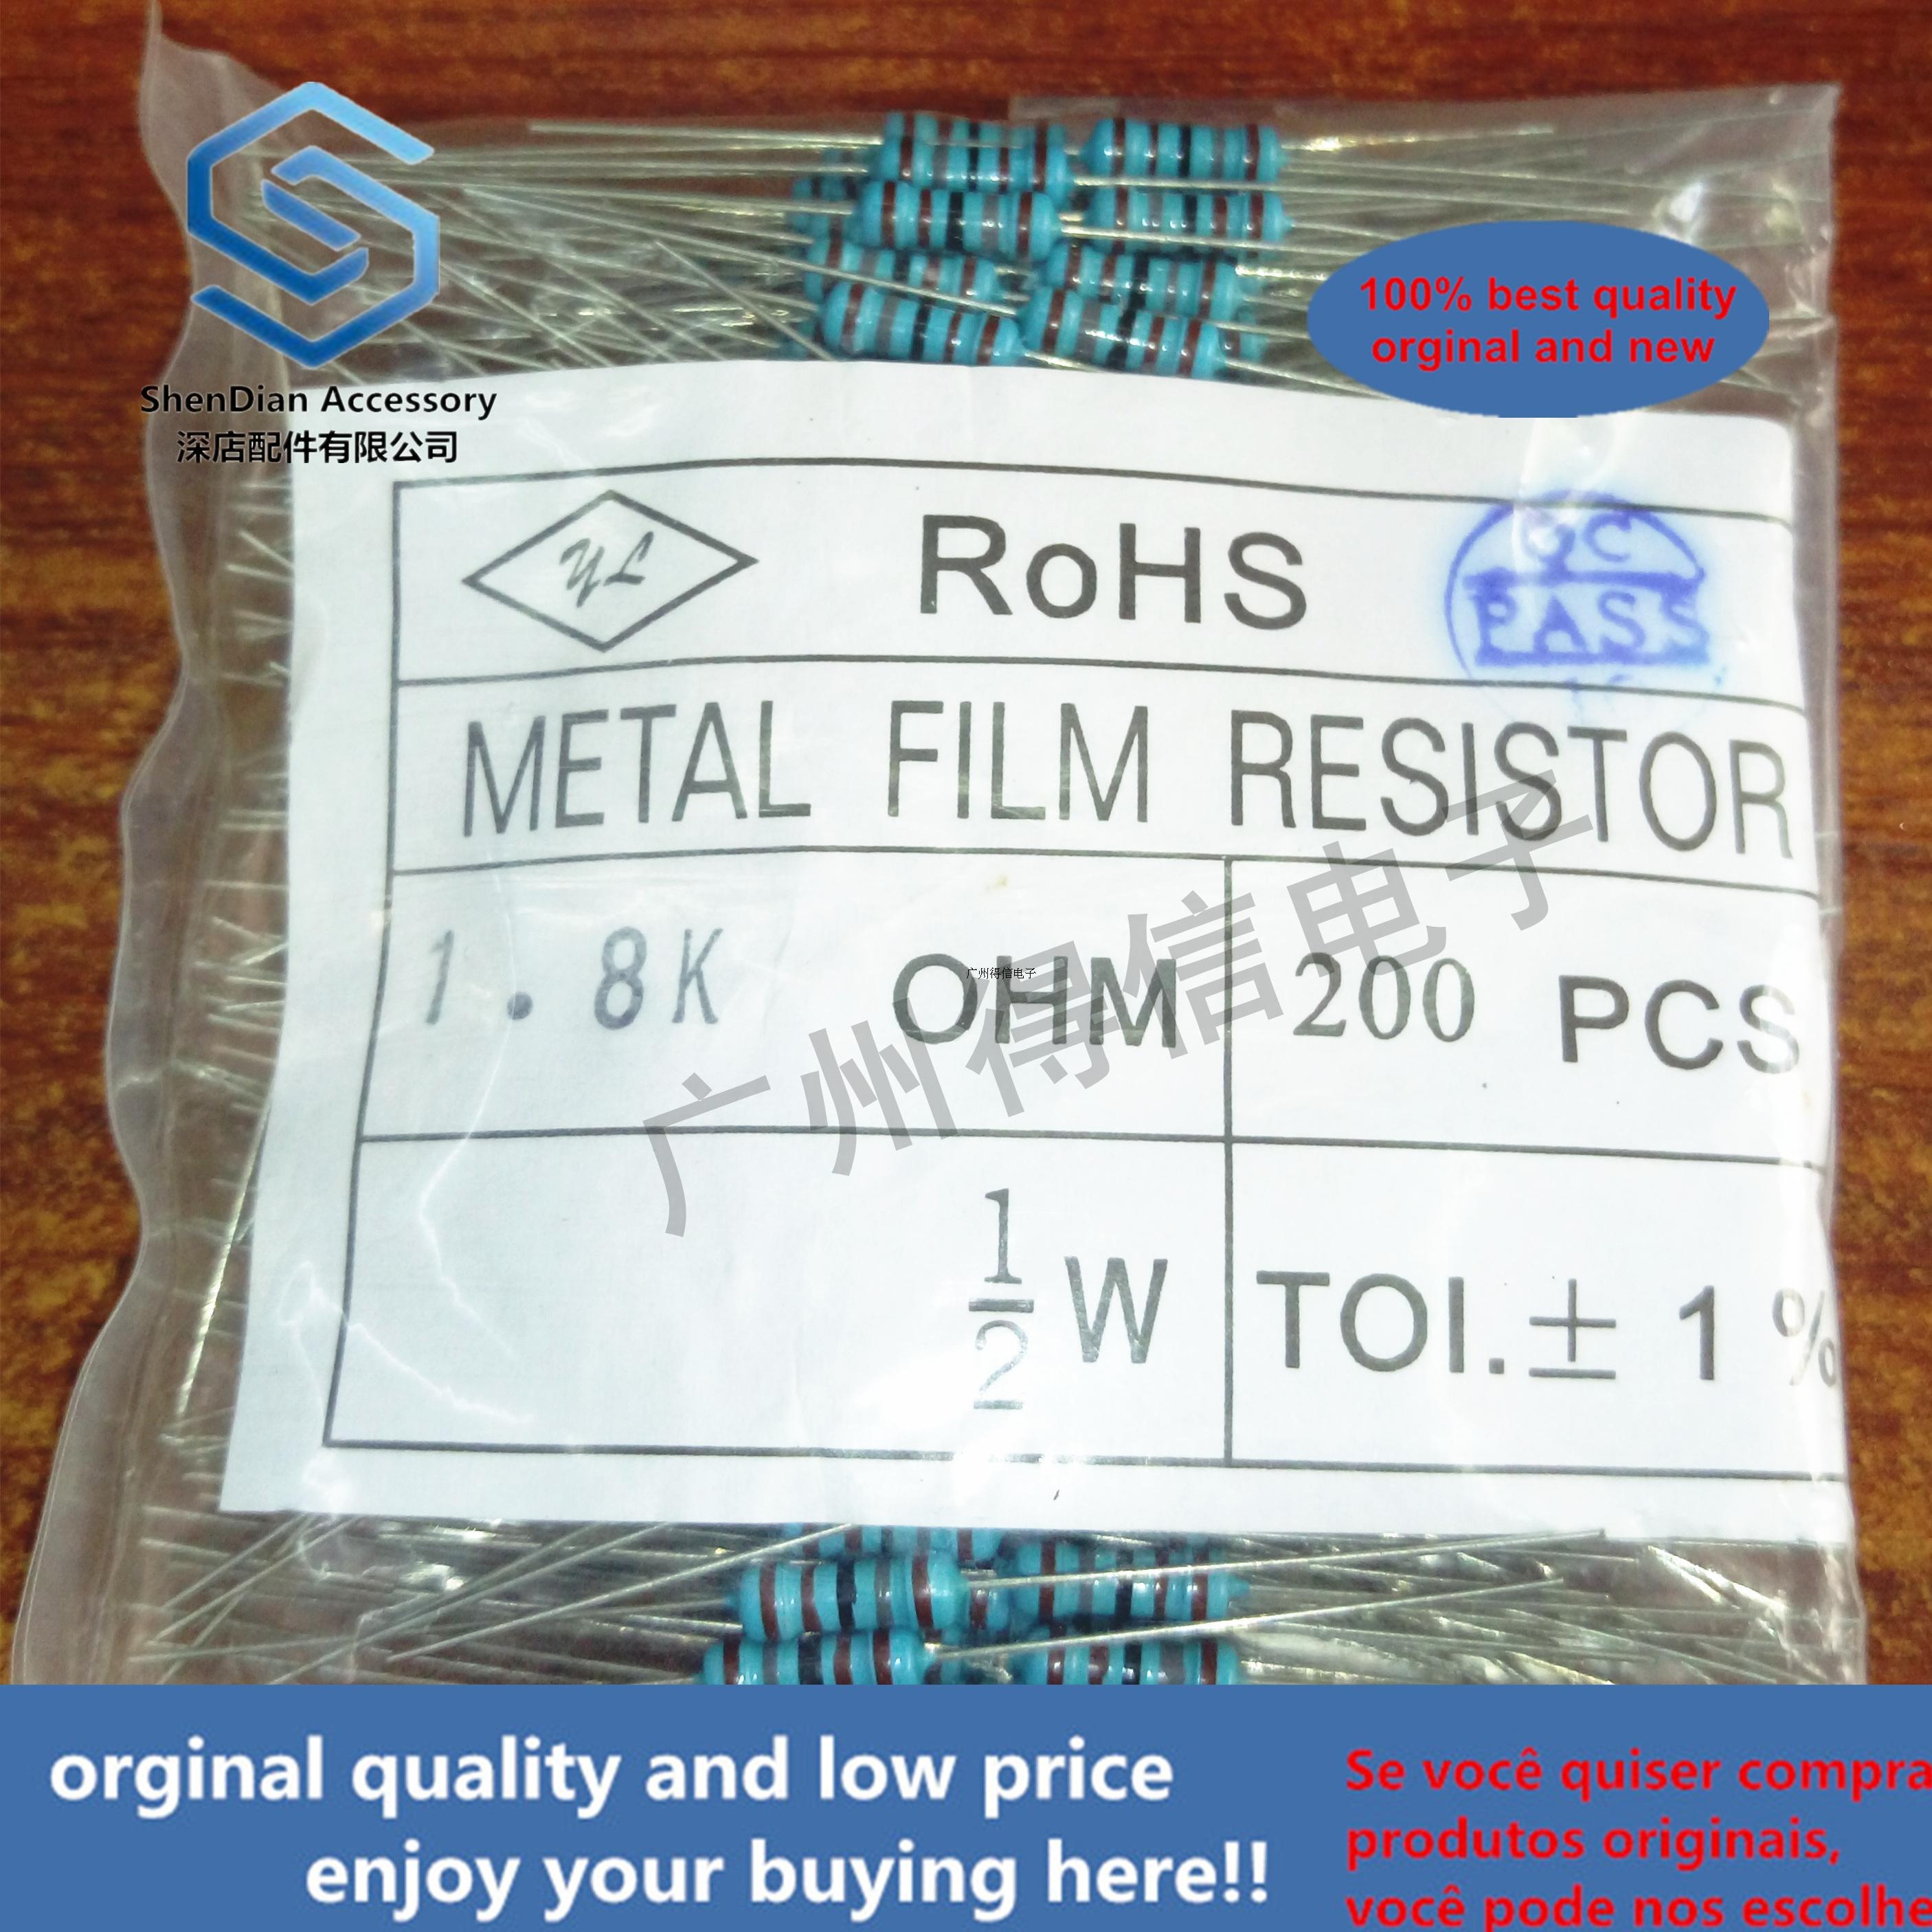 200pcs 1 / 2W 360K 1% Brand New Metal Film Iron Feet Resistance Bag 200 Pcs Per Pack